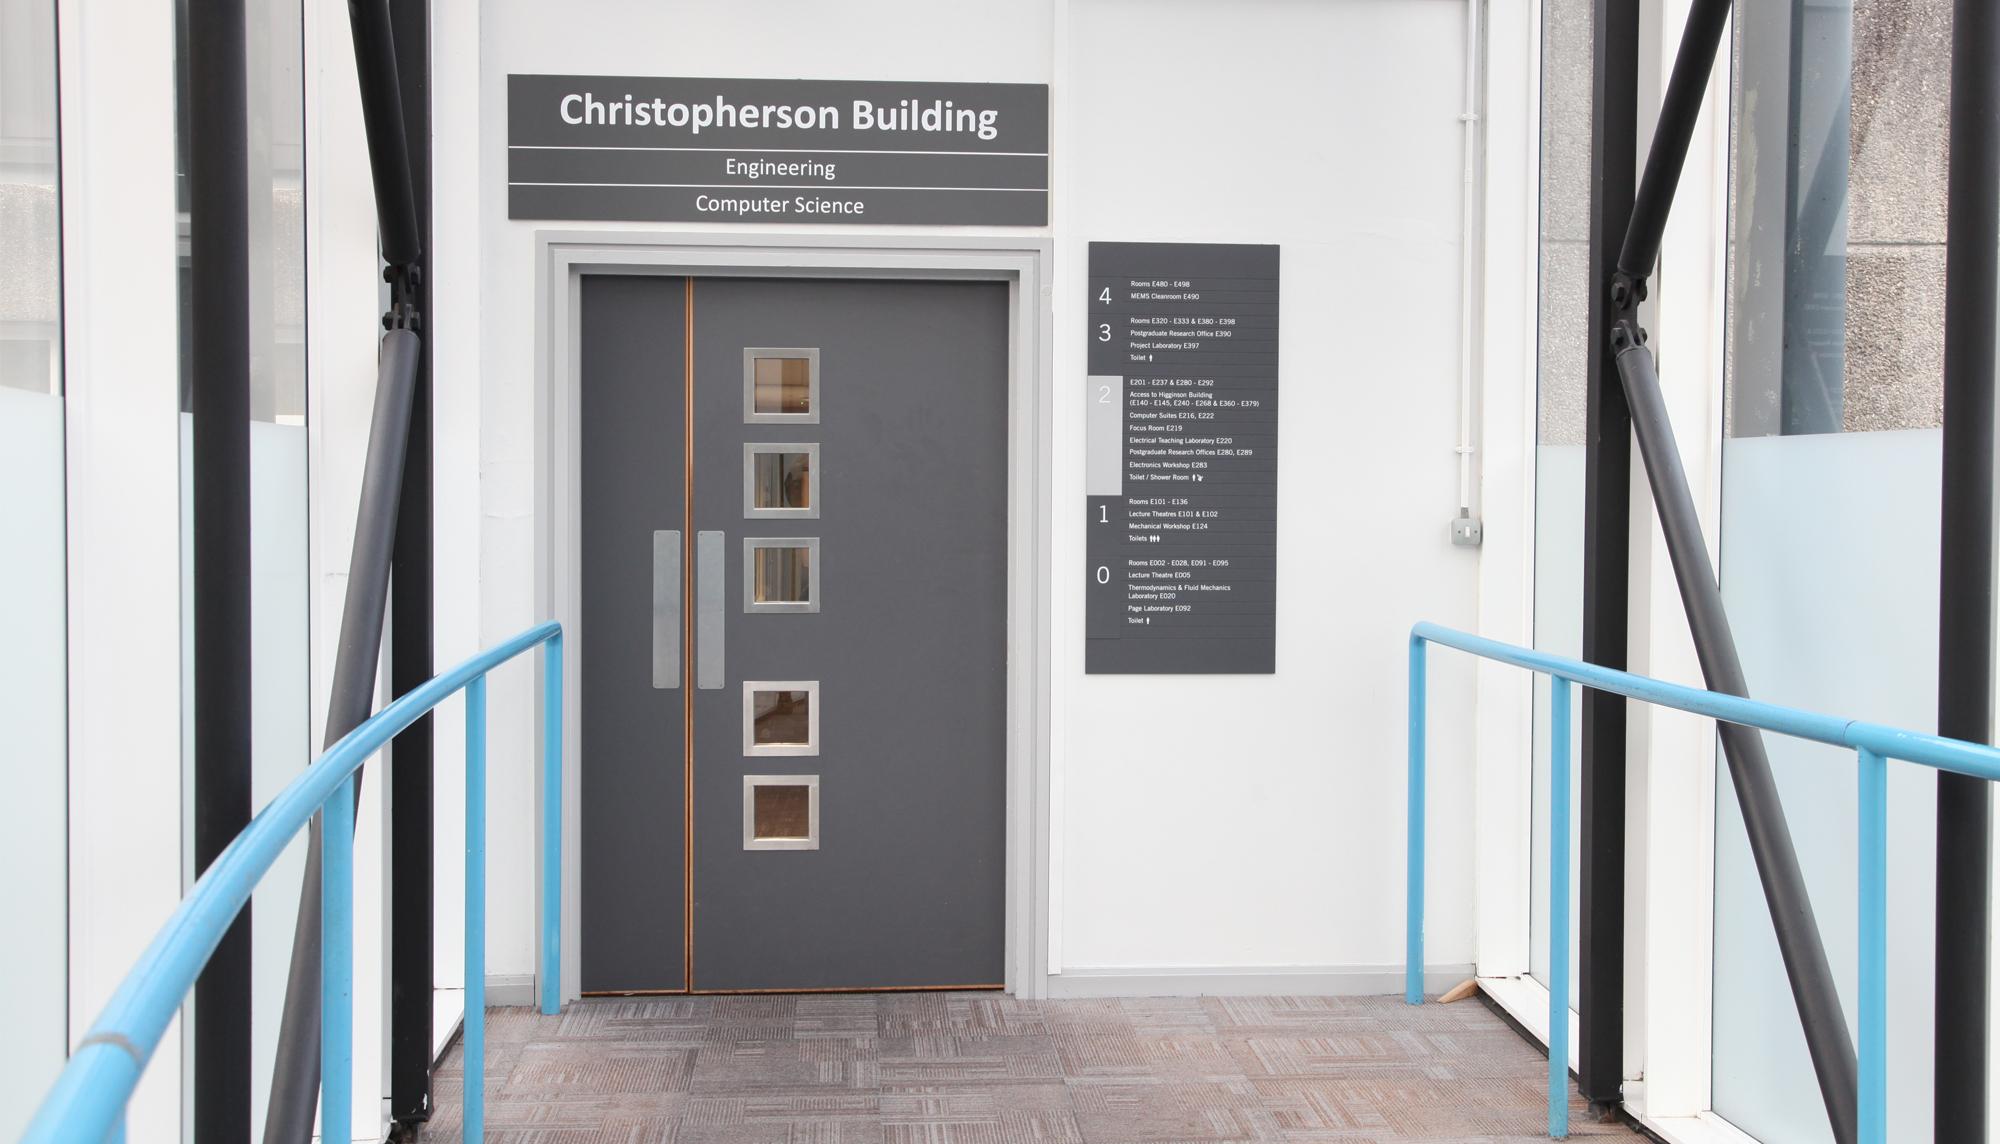 Durham Christopherson Building